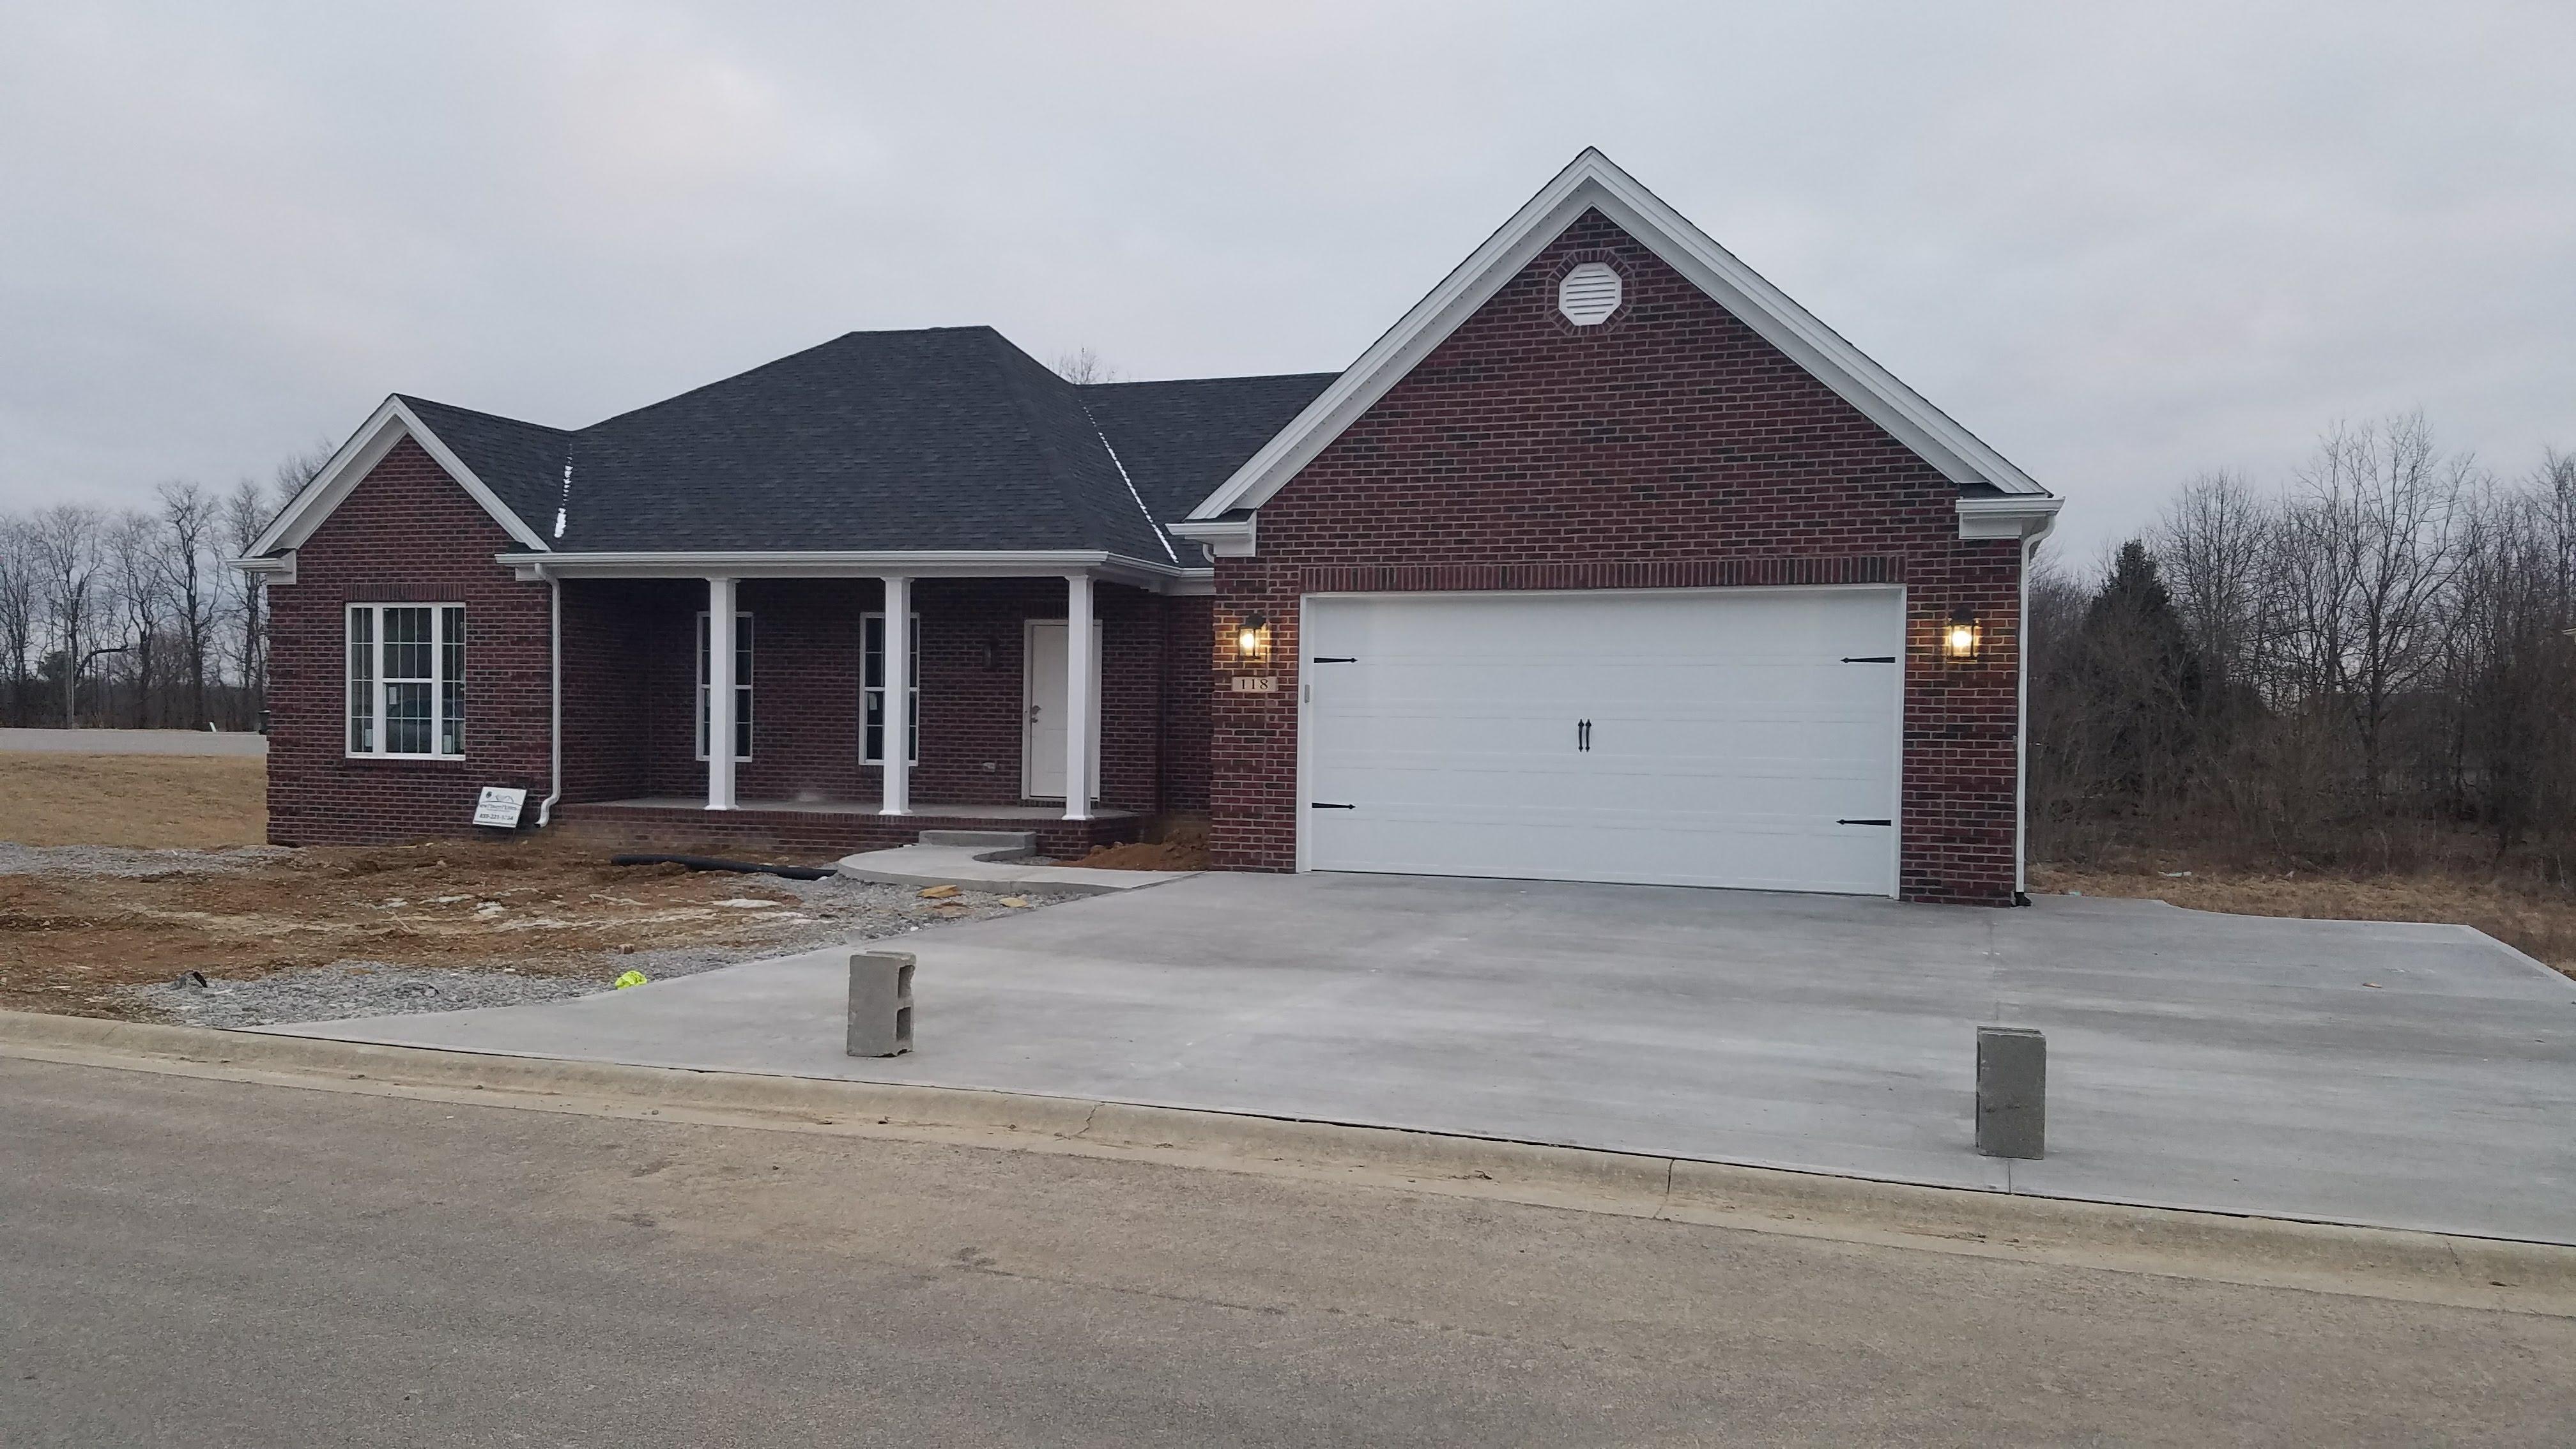 M K 2 Home Improvement Llc